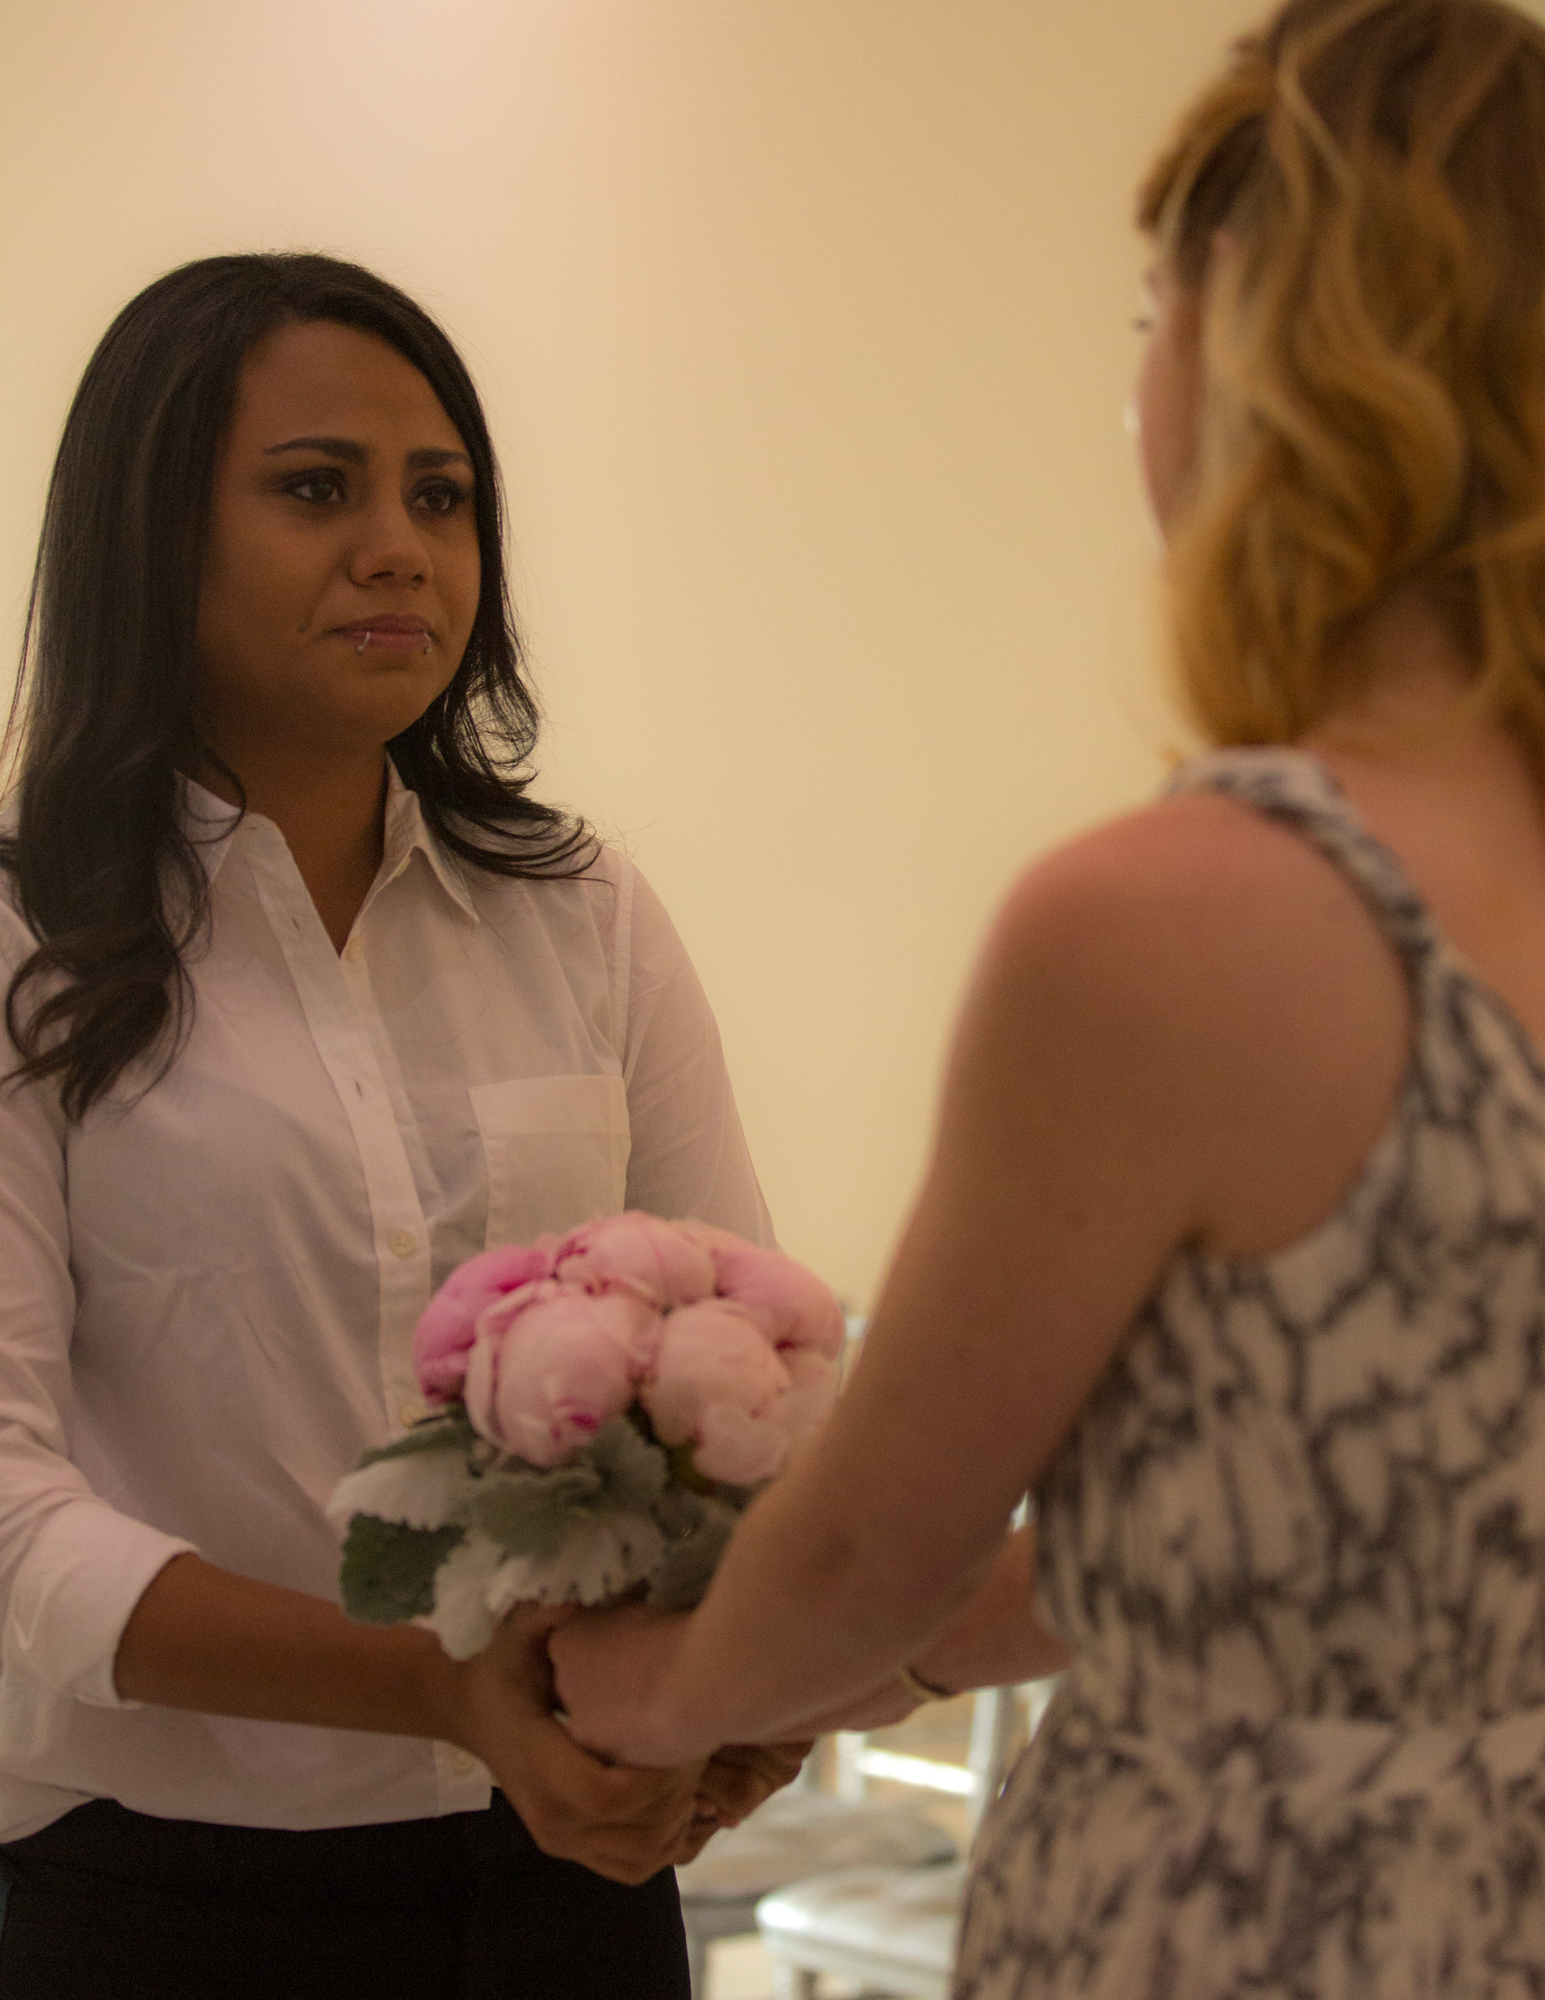 Colleen Stavrakos Wedding Photography brides holding bouquet